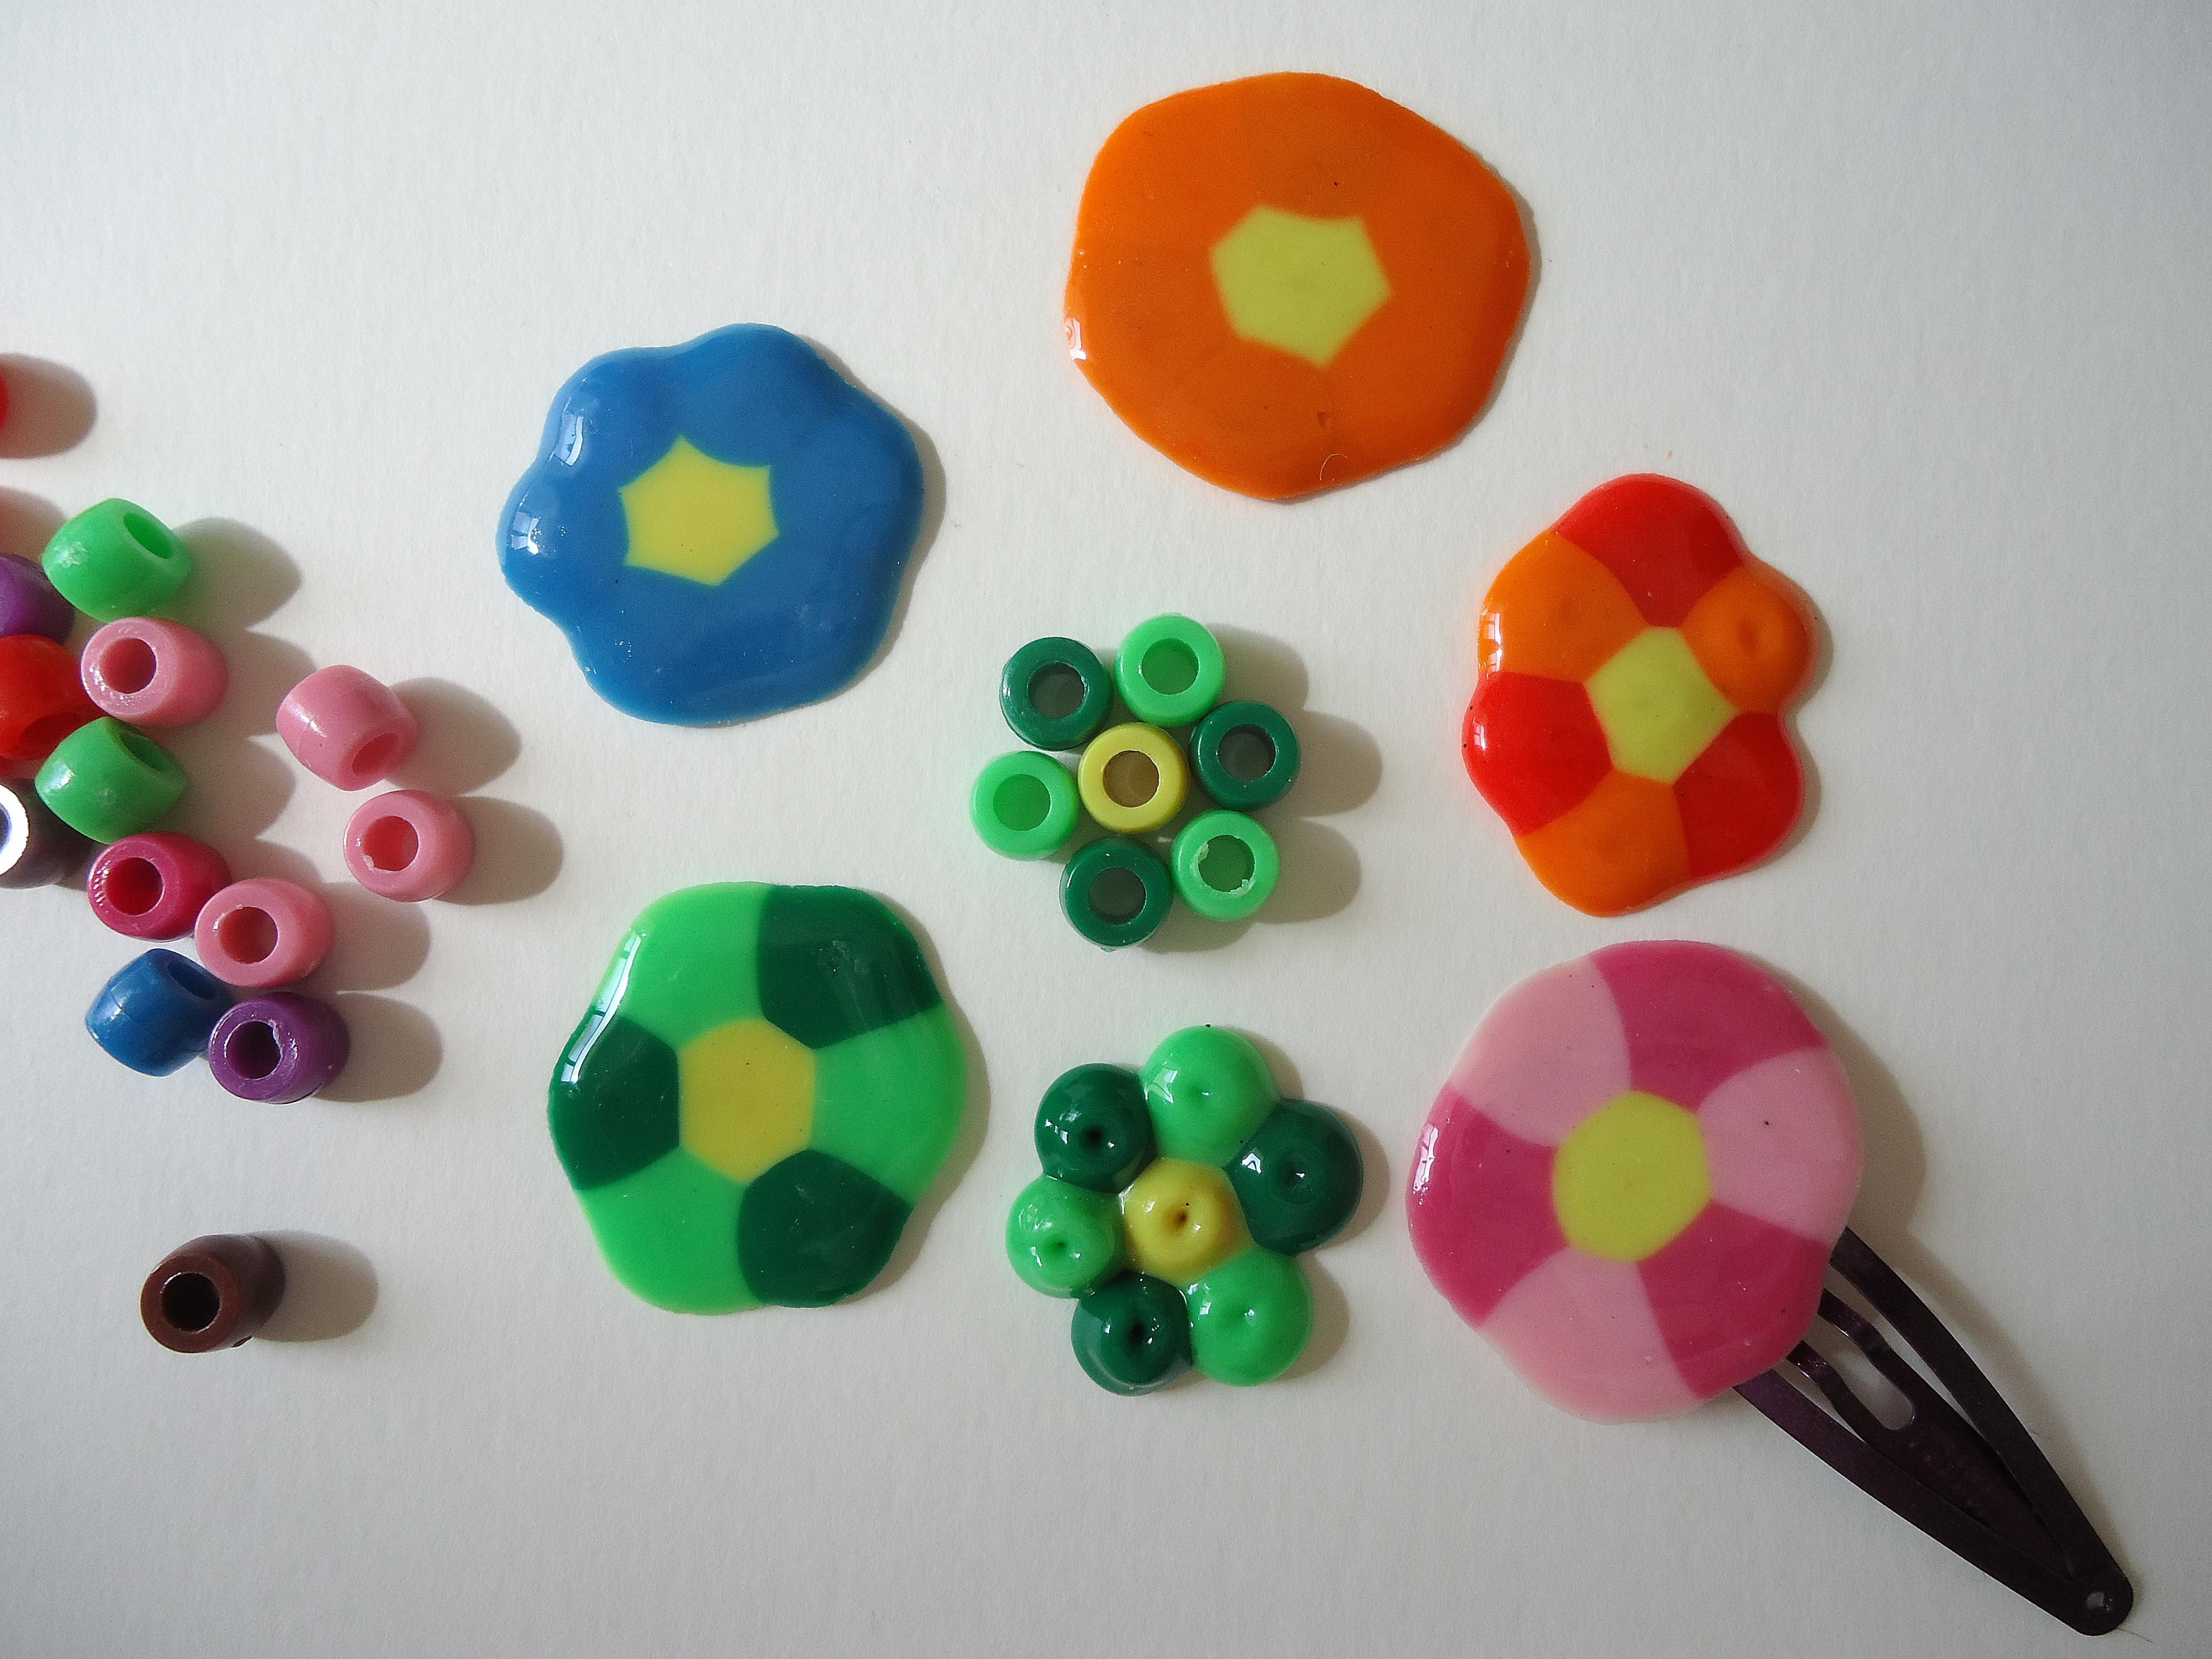 Dorable Diseño De Uñas Paso A Paso Las Flores Modelo - Ideas Para ...